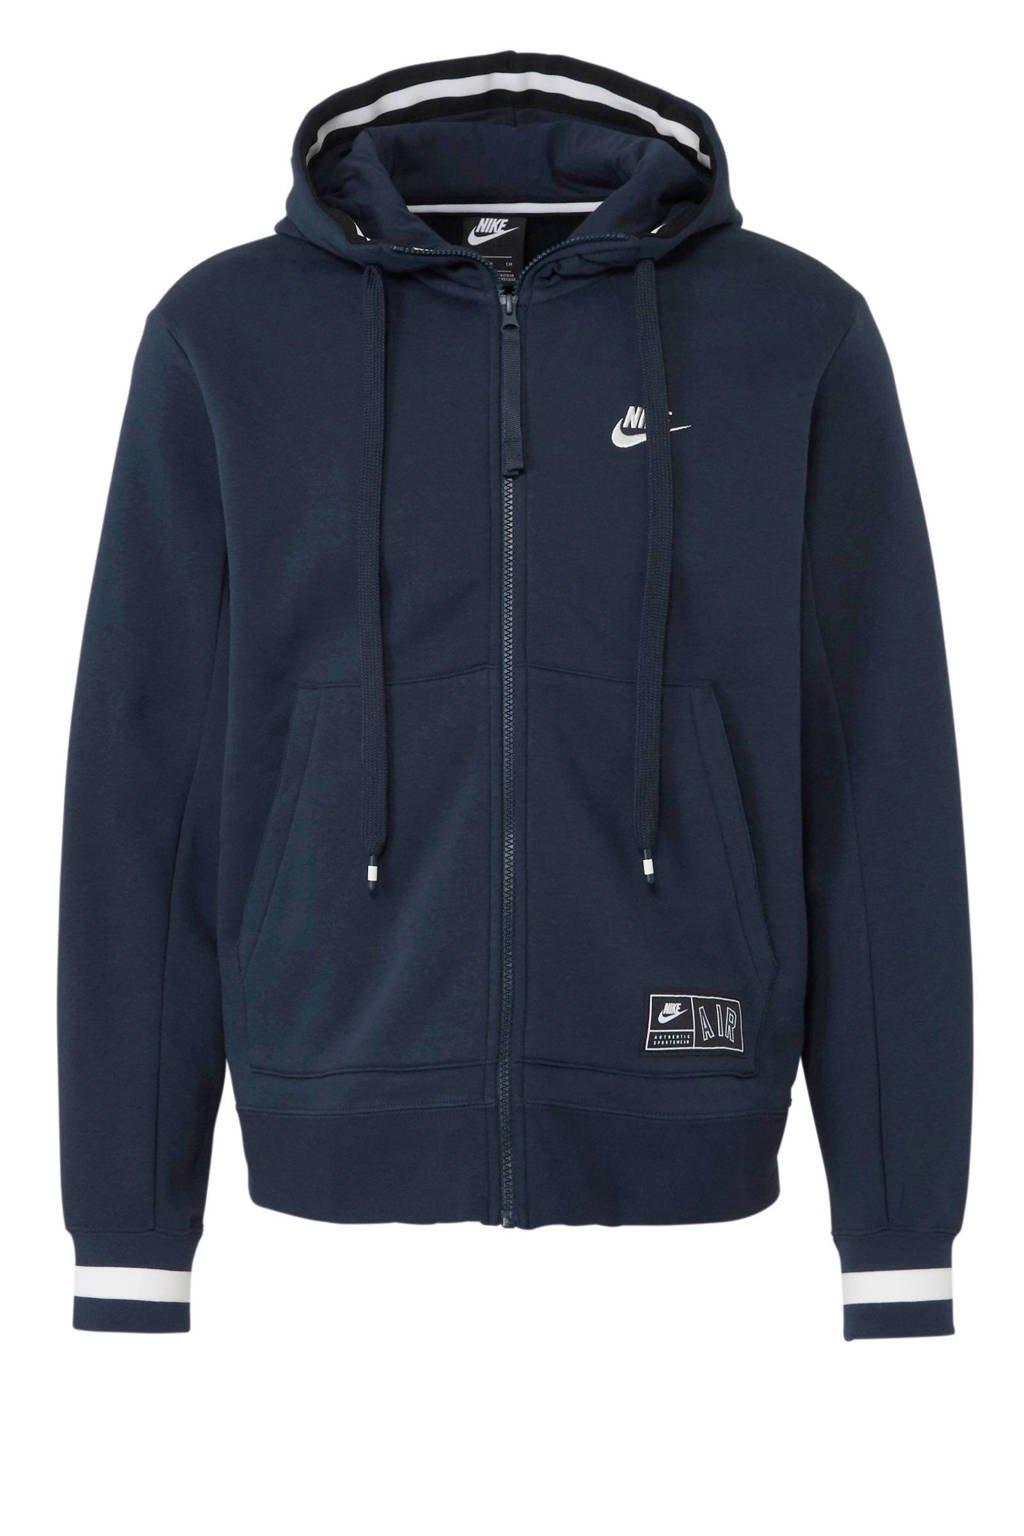 Nike   sportvest donkerblauw, Donkerblauw